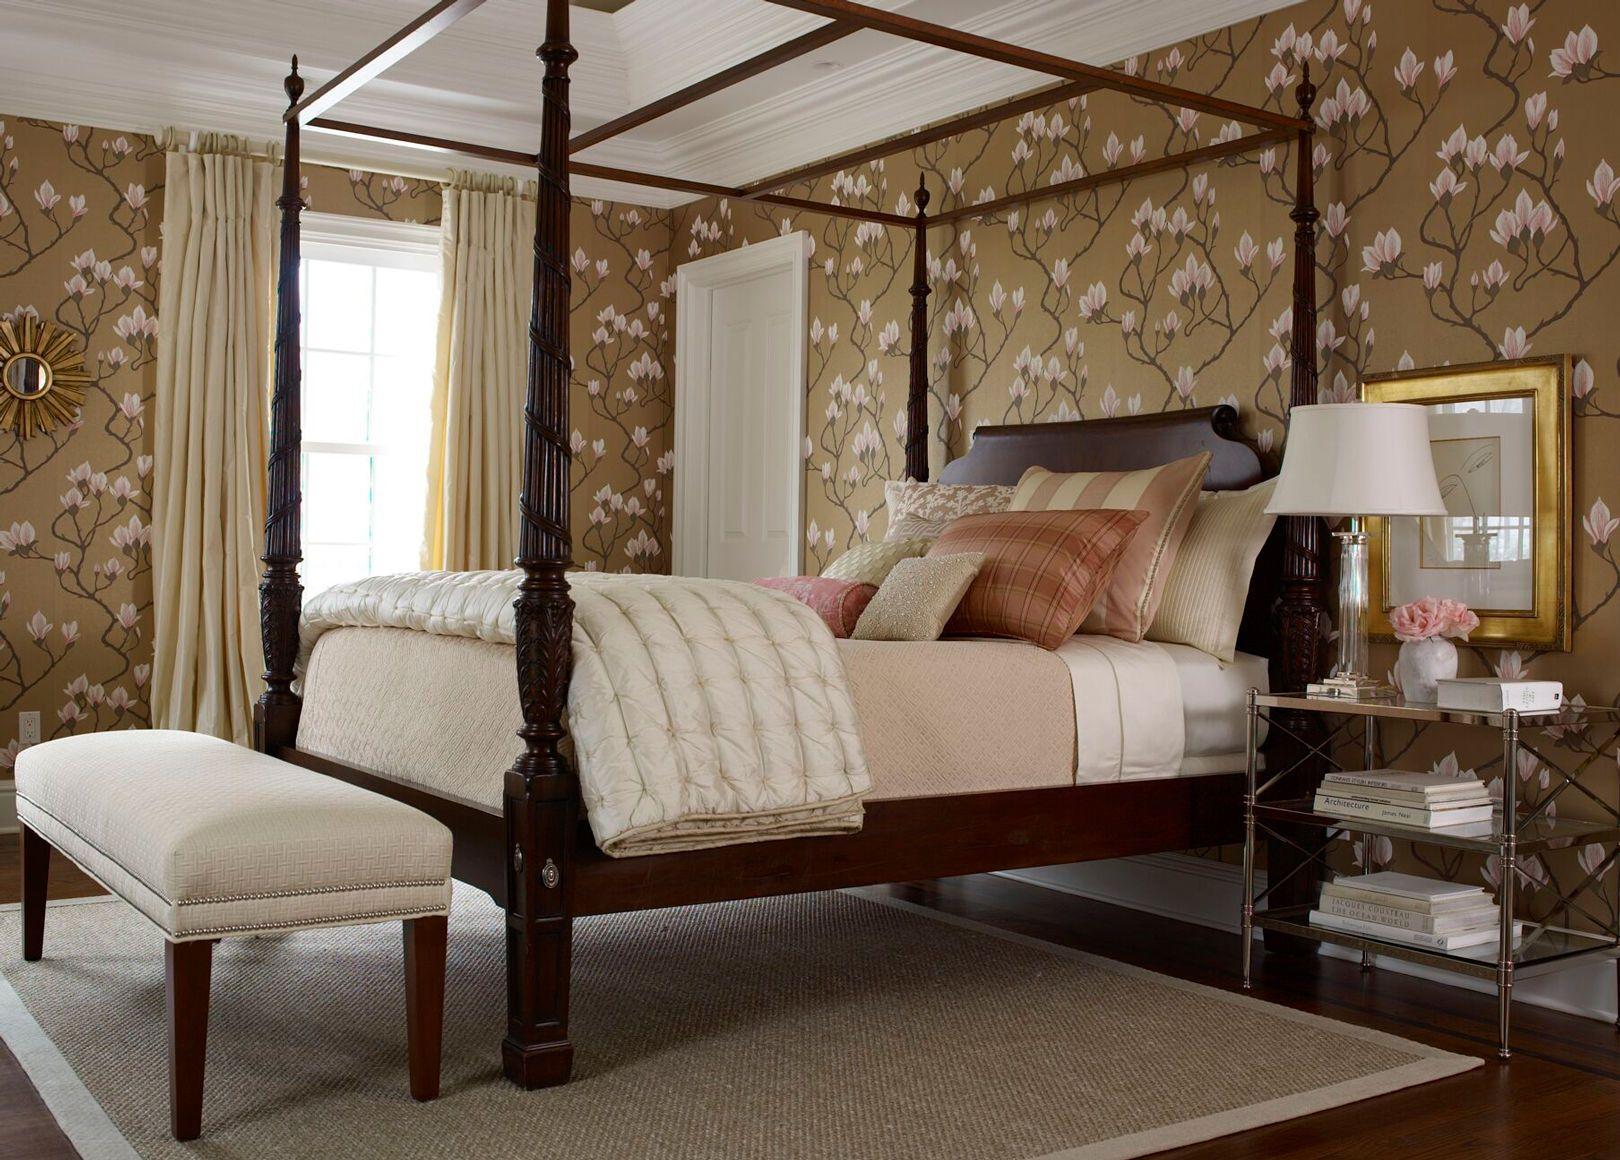 Laurel Canopy Frame Ethan Allen Sweet Dreams Pinterest